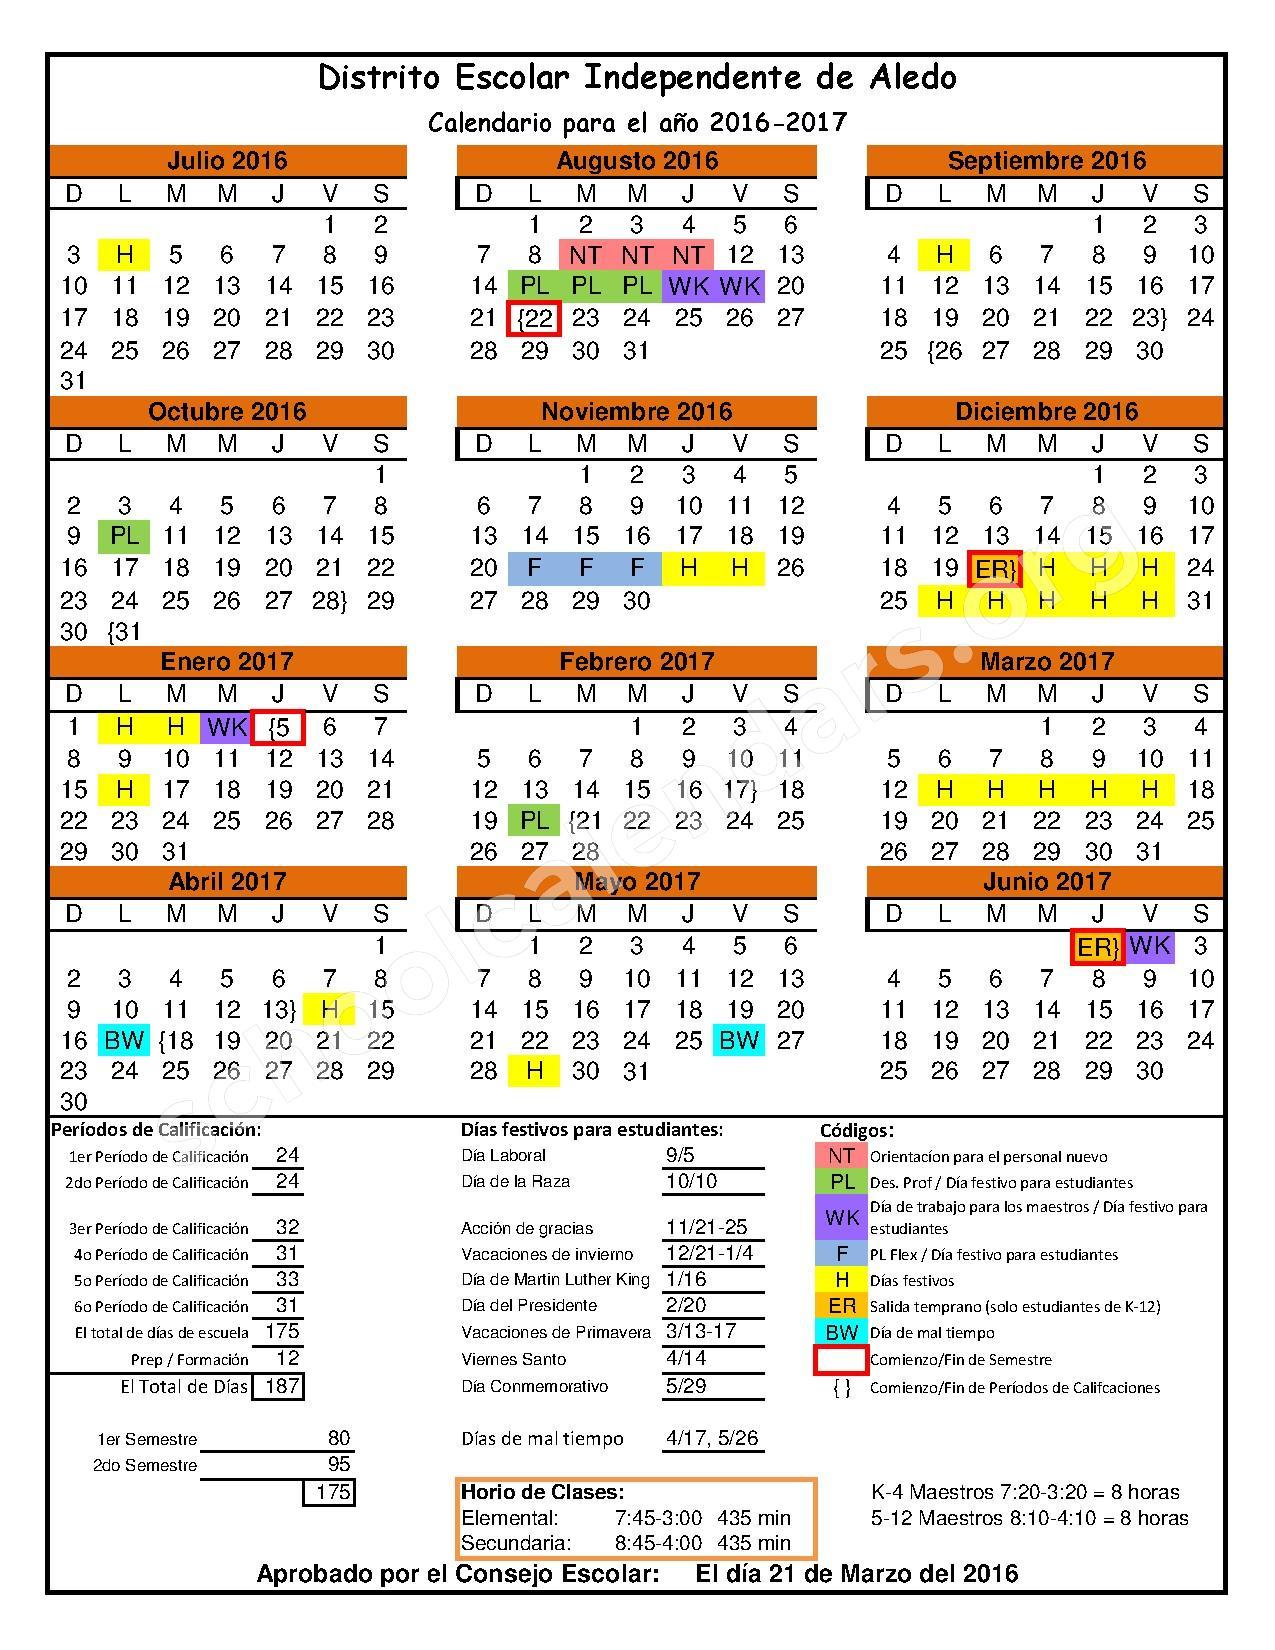 2016 - 2017 District Calendar – Aledo Independent School District – page 1